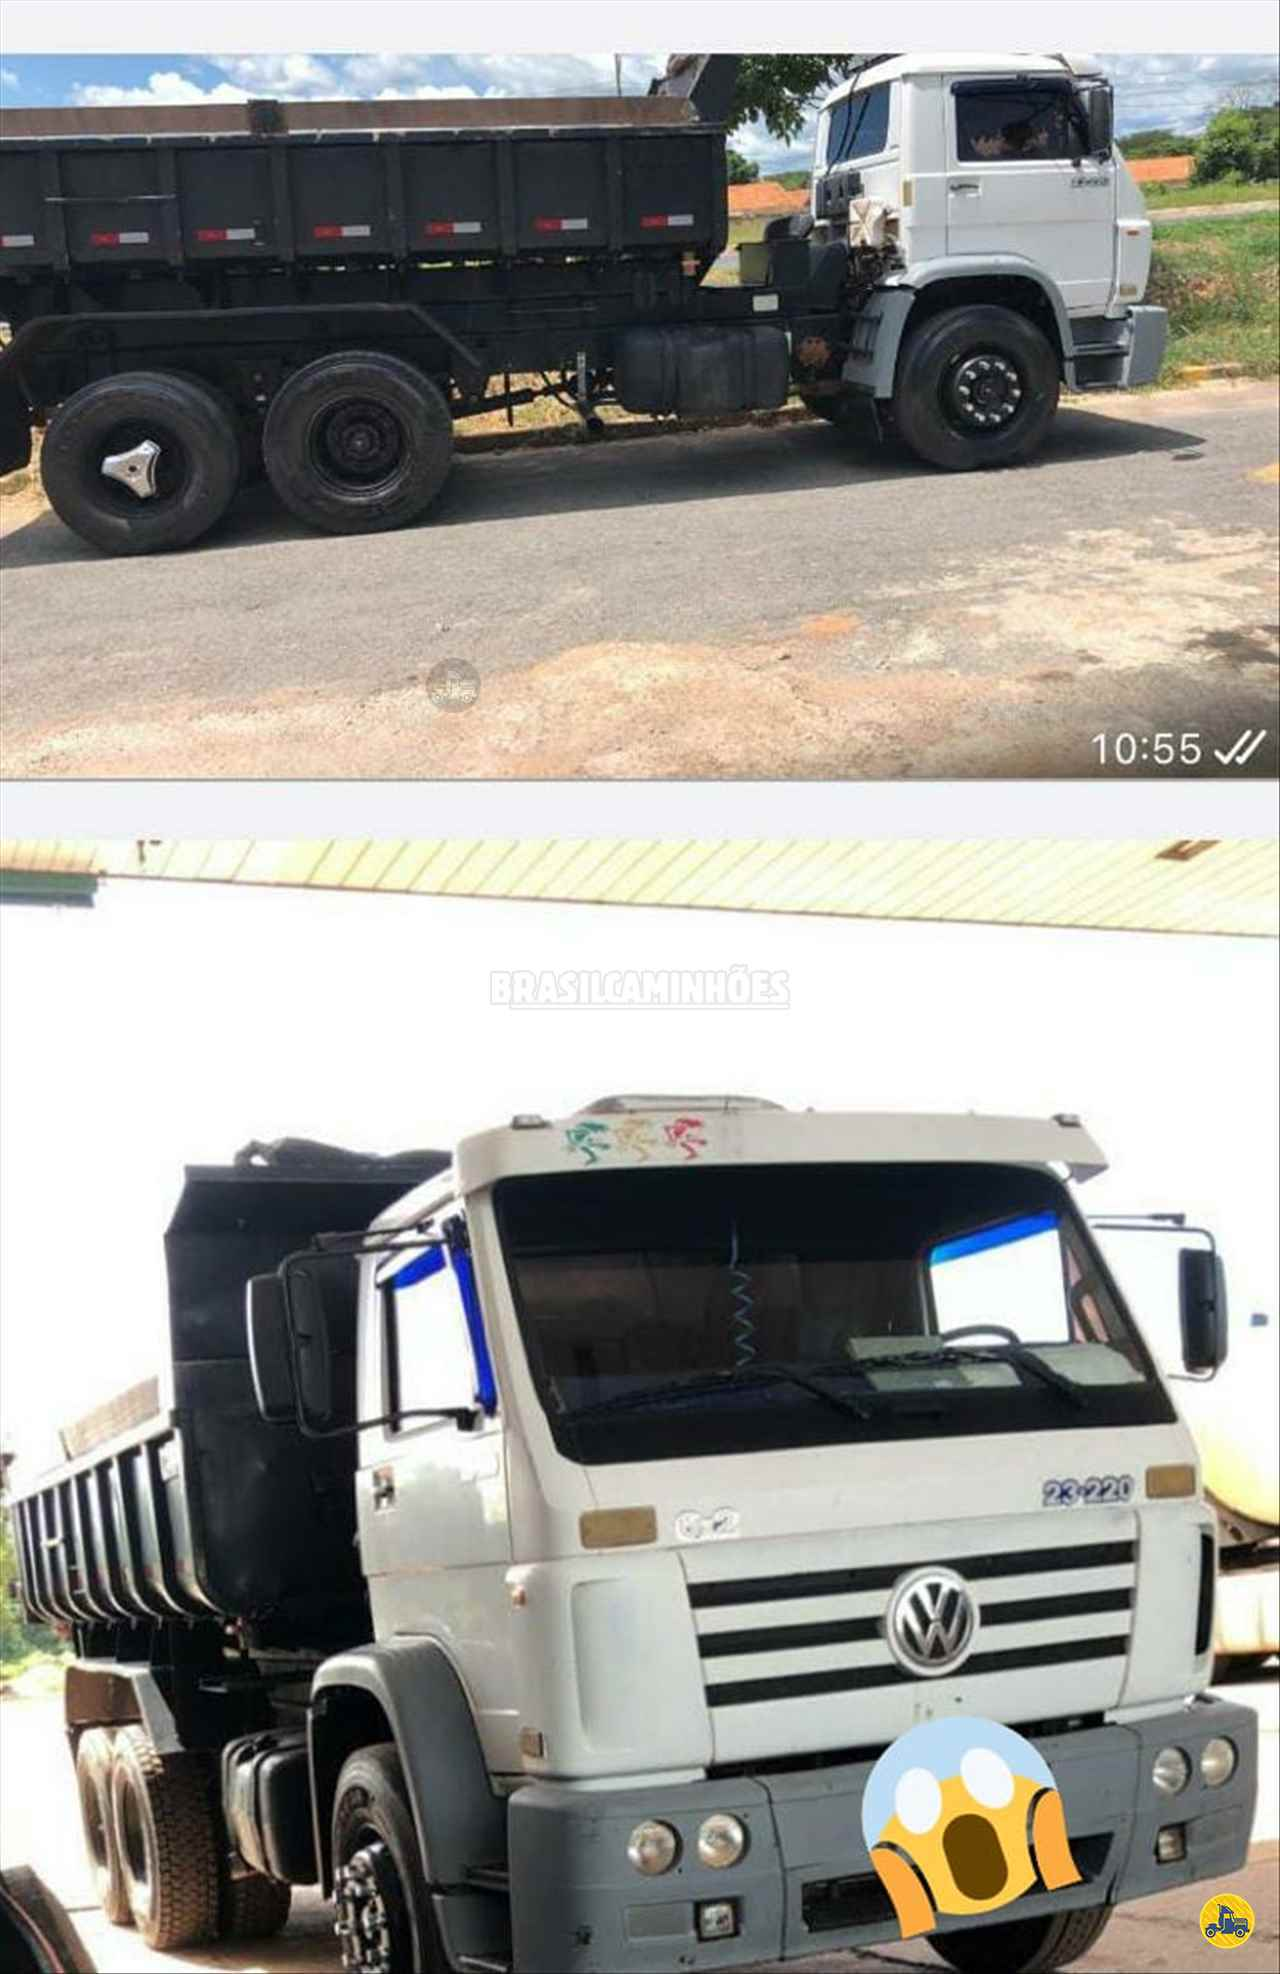 CAMINHAO VOLKSWAGEN VW 23220 Caçamba Basculante Truck 6x2 Brasil Caminhões Sinop SINOP MATO GROSSO MT